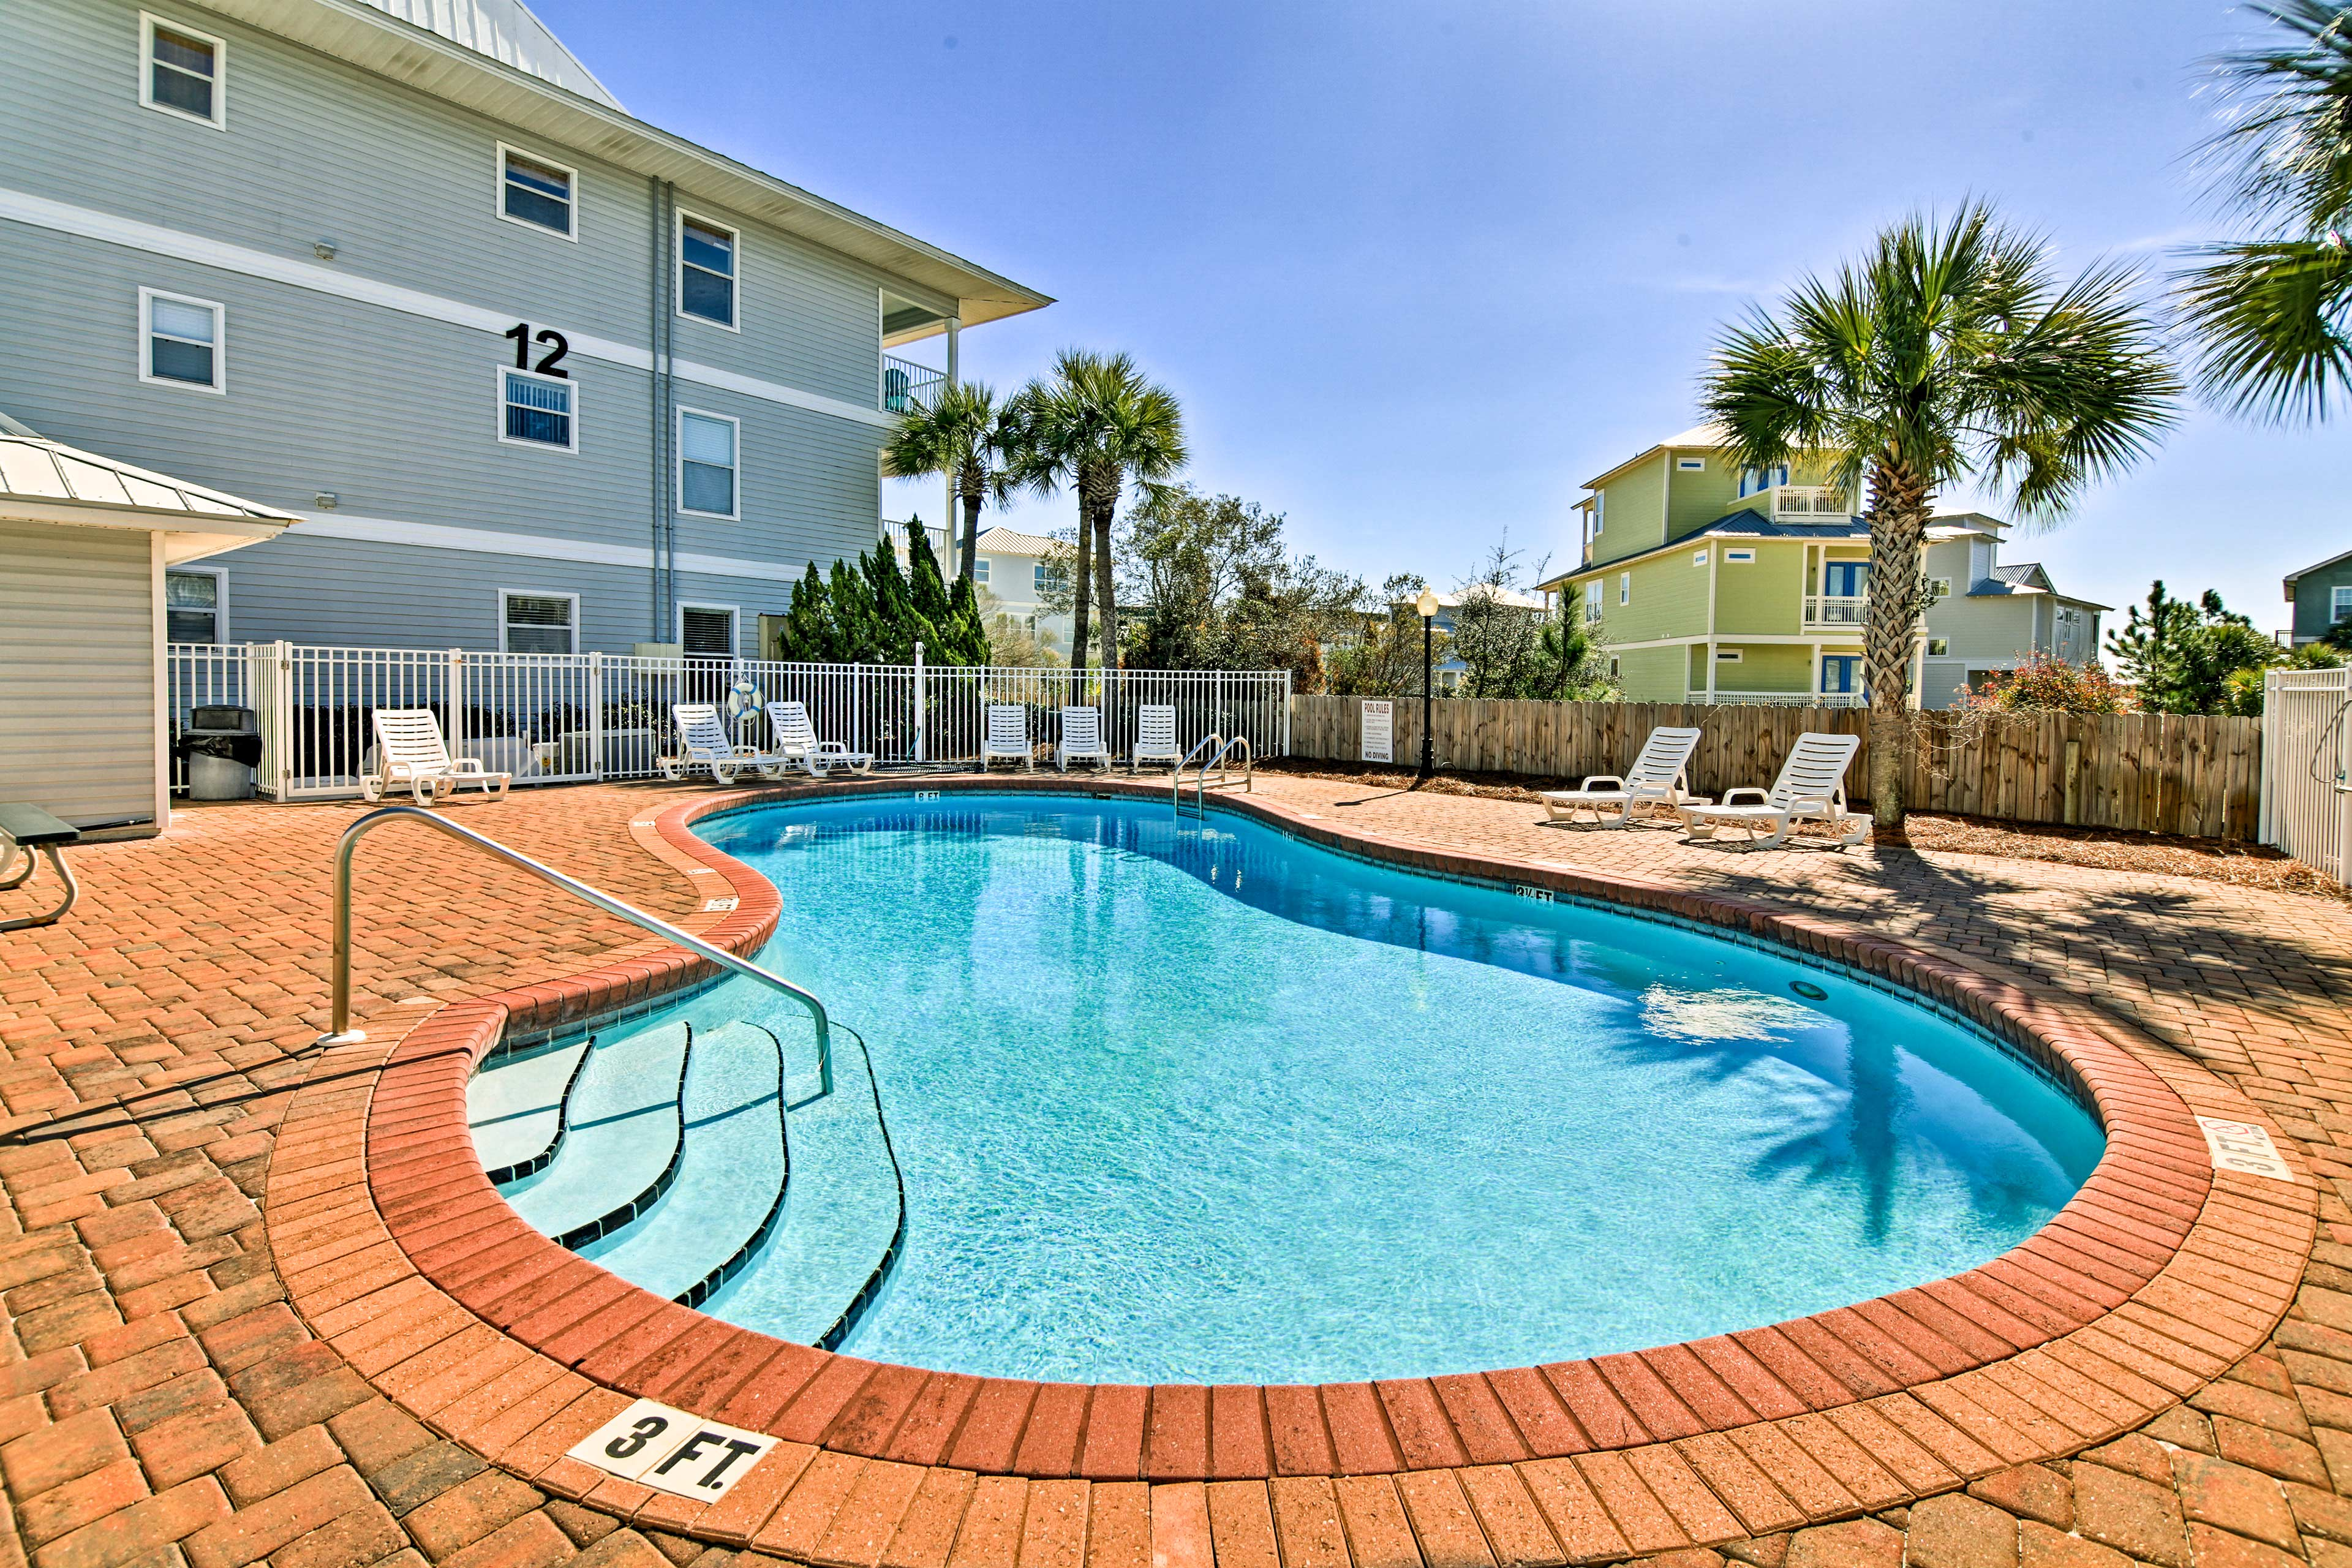 Swim laps in one of the 2 community pools.